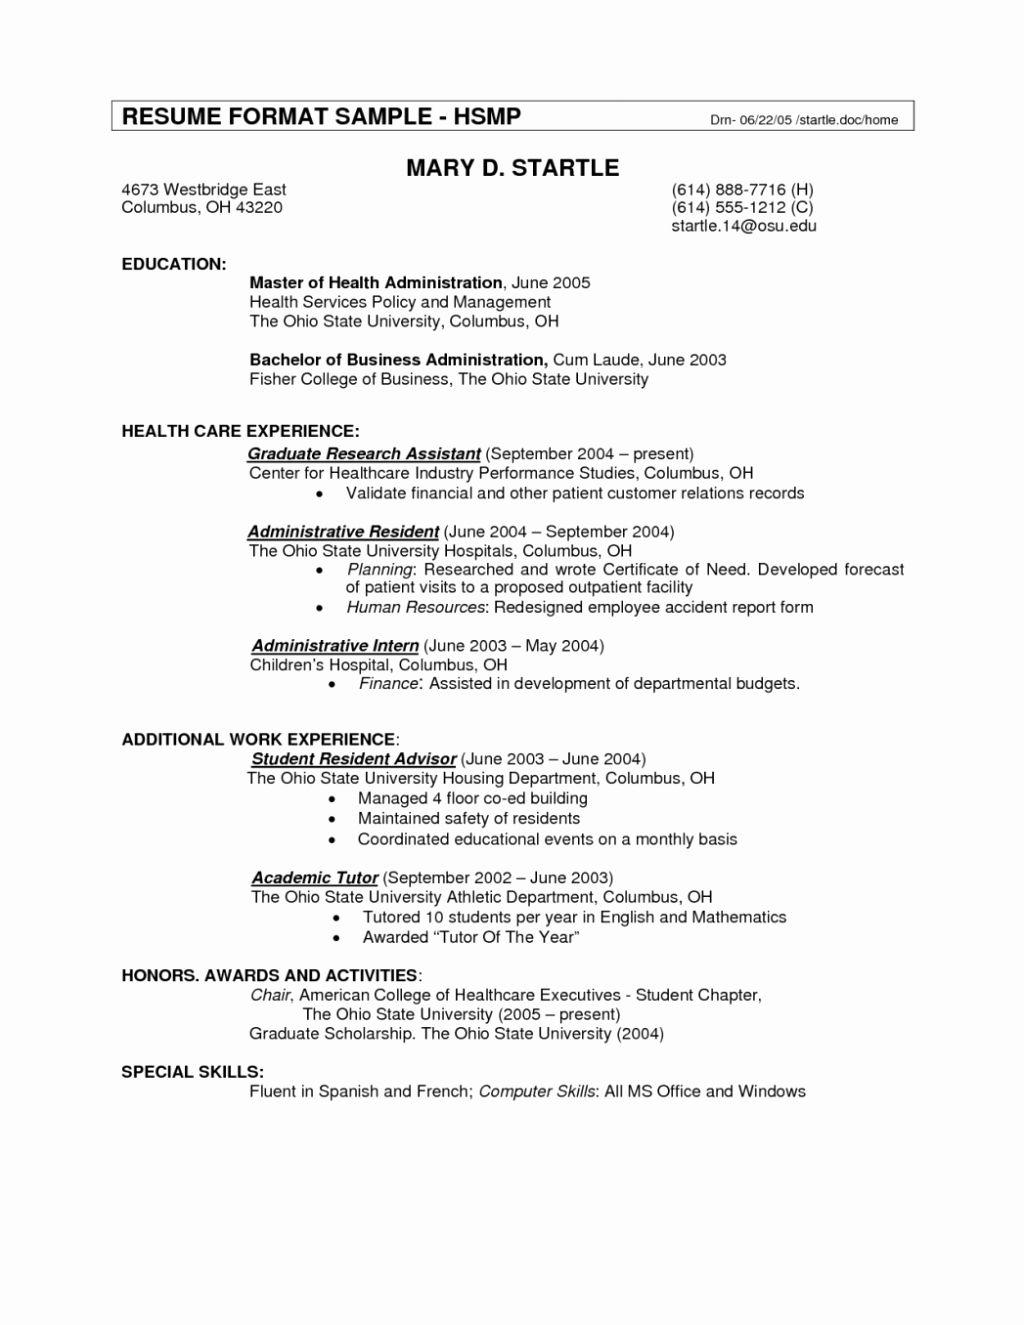 Zoo Resume template free, Resume, Resume format